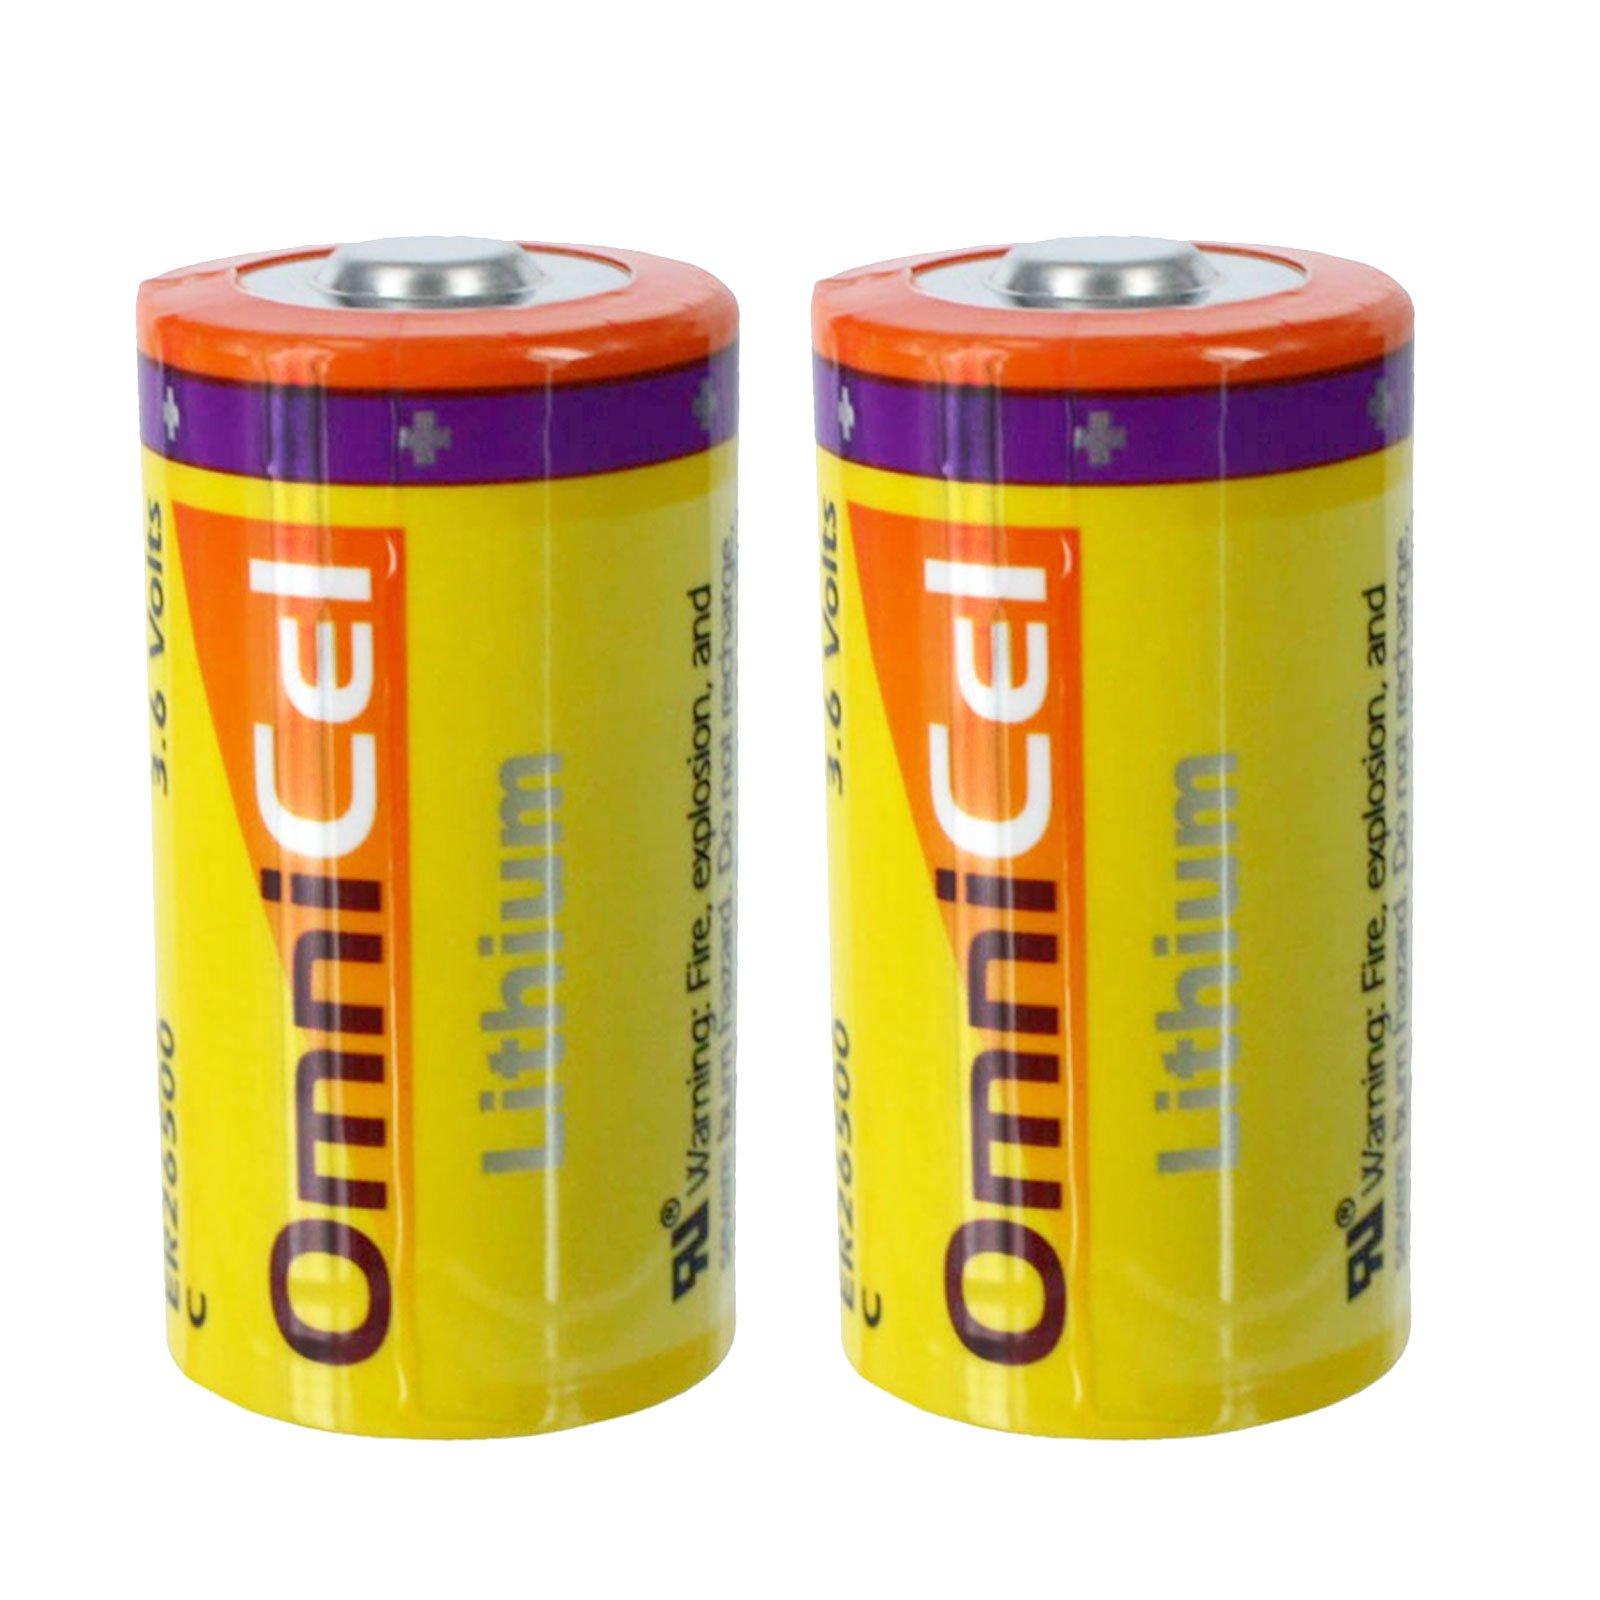 2x OmniCel ER26500 3.6V 8.5Ah Sz C Lithium Button Top Battery RFID Beacons AMR